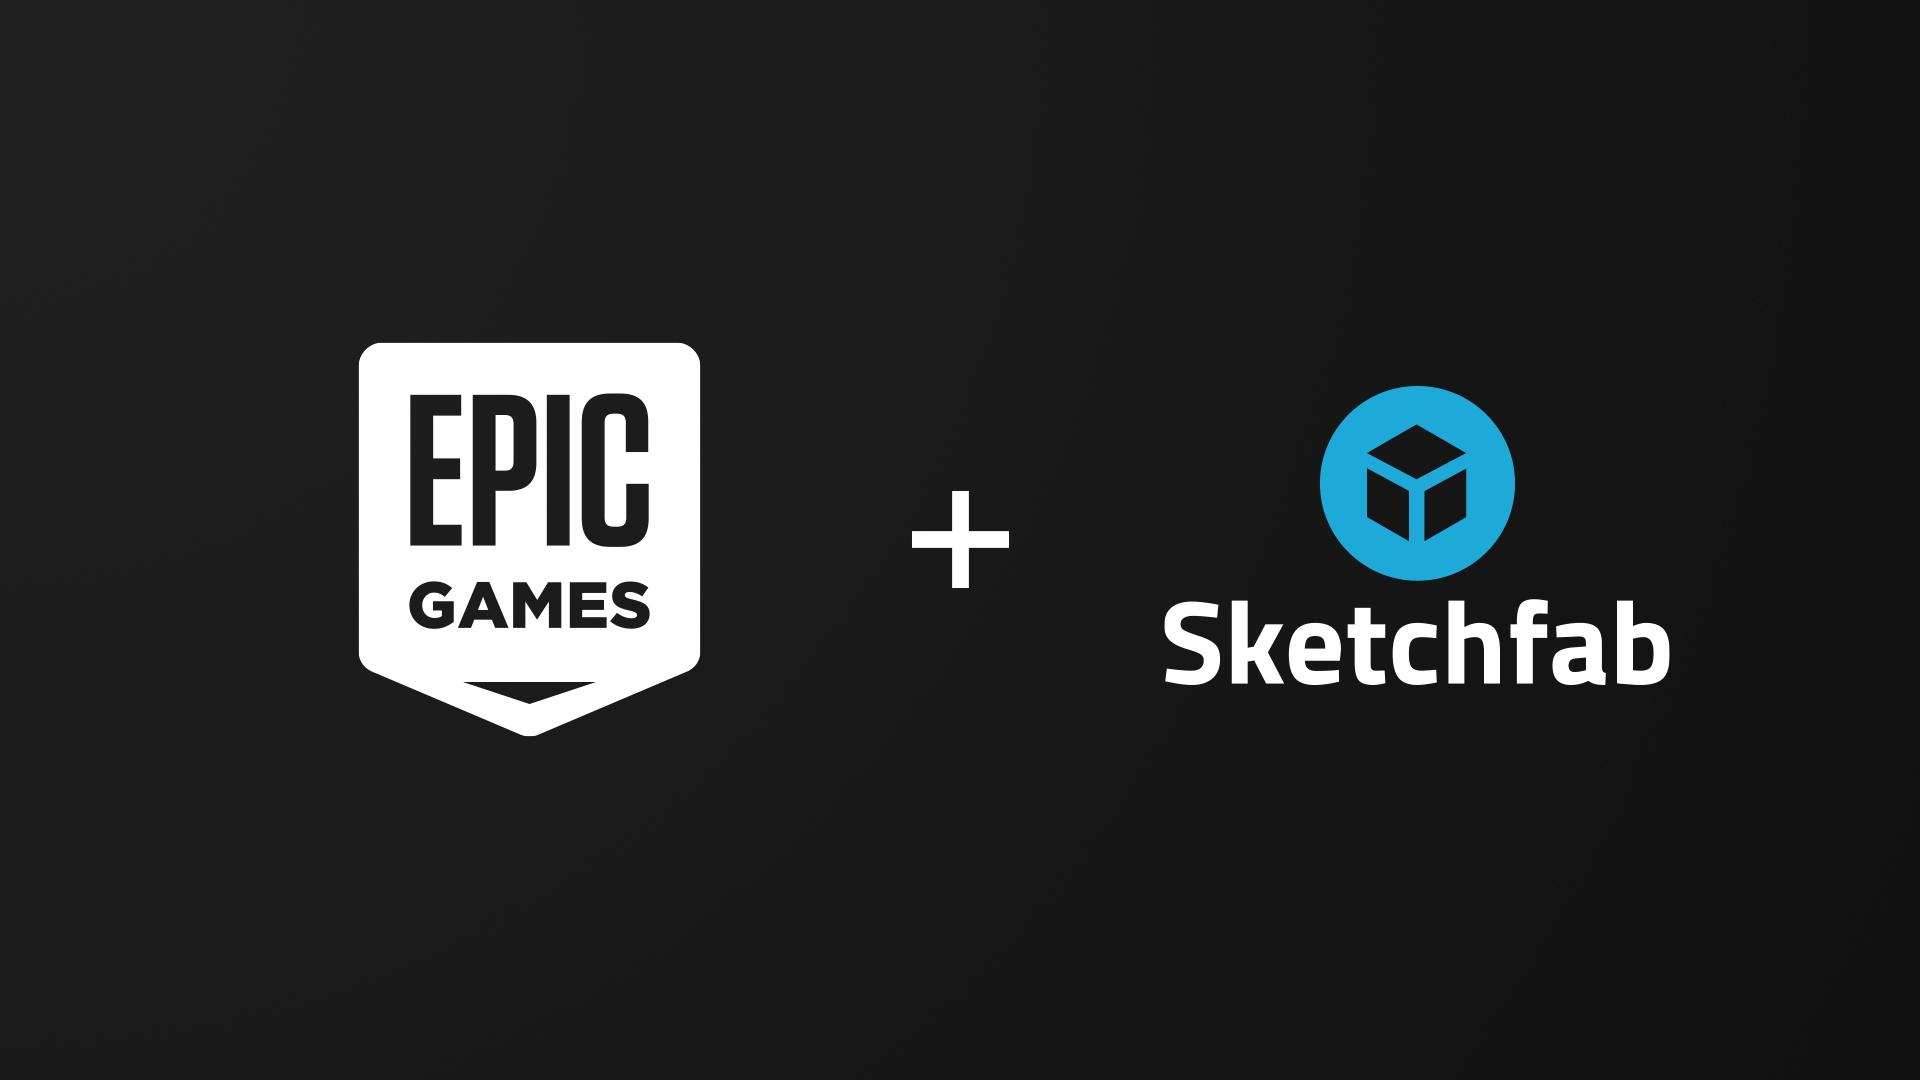 Epic Games Sketchfab